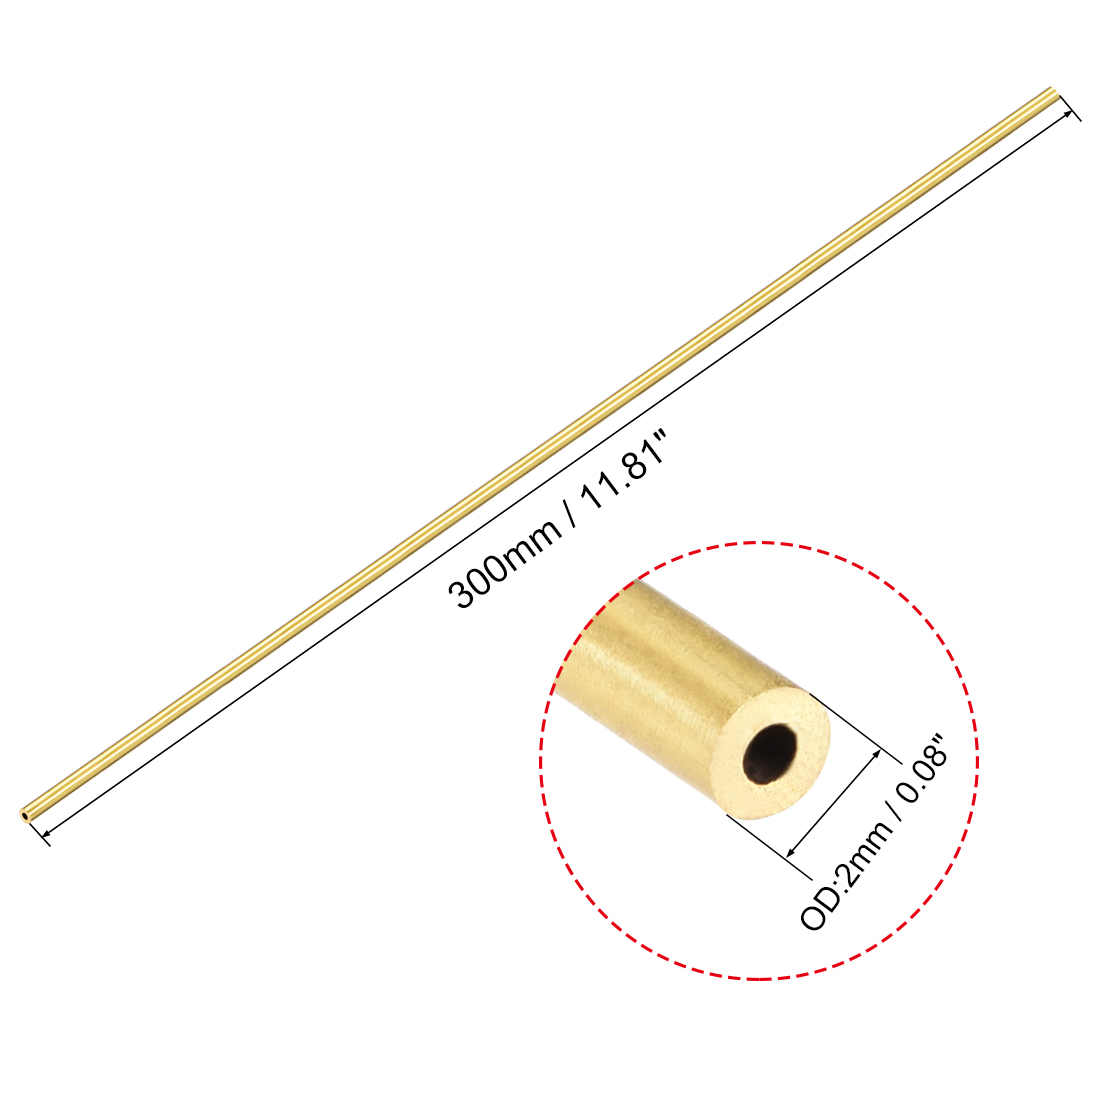 Brass Mini Angles 300mm Long 1.5mm x 1.5mm x 0.3mm